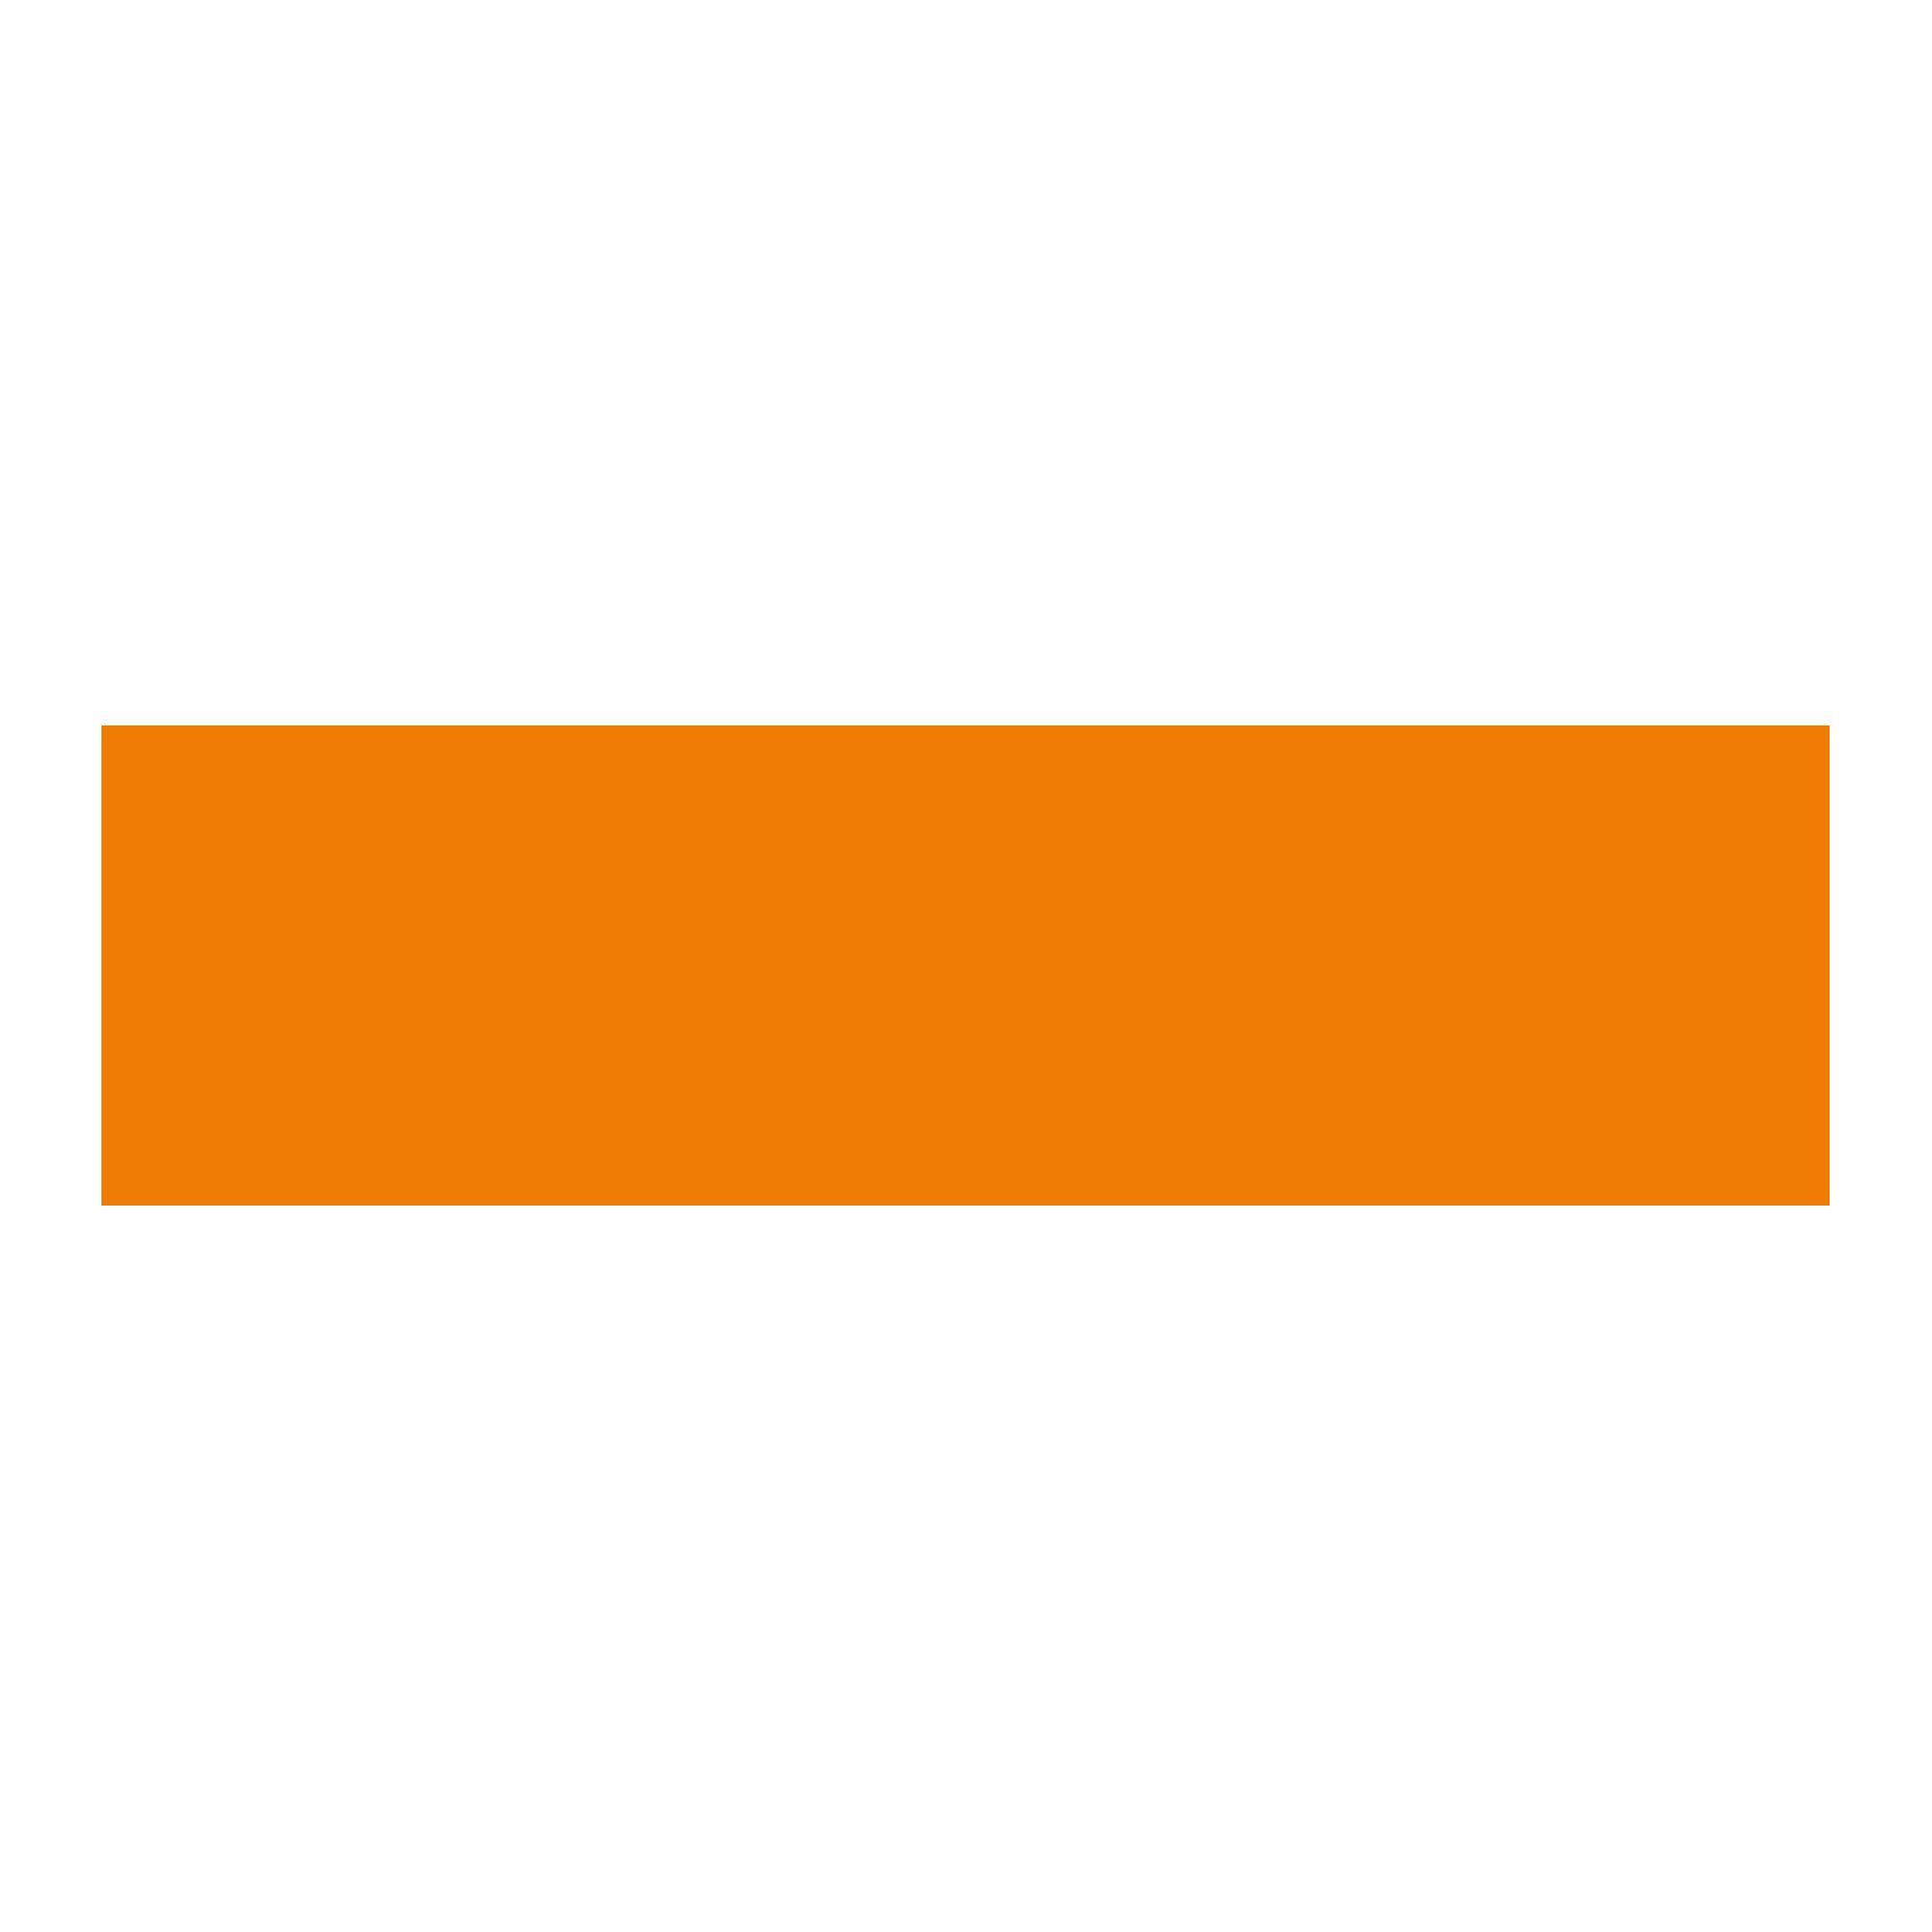 Teesside University Business School typography visual language